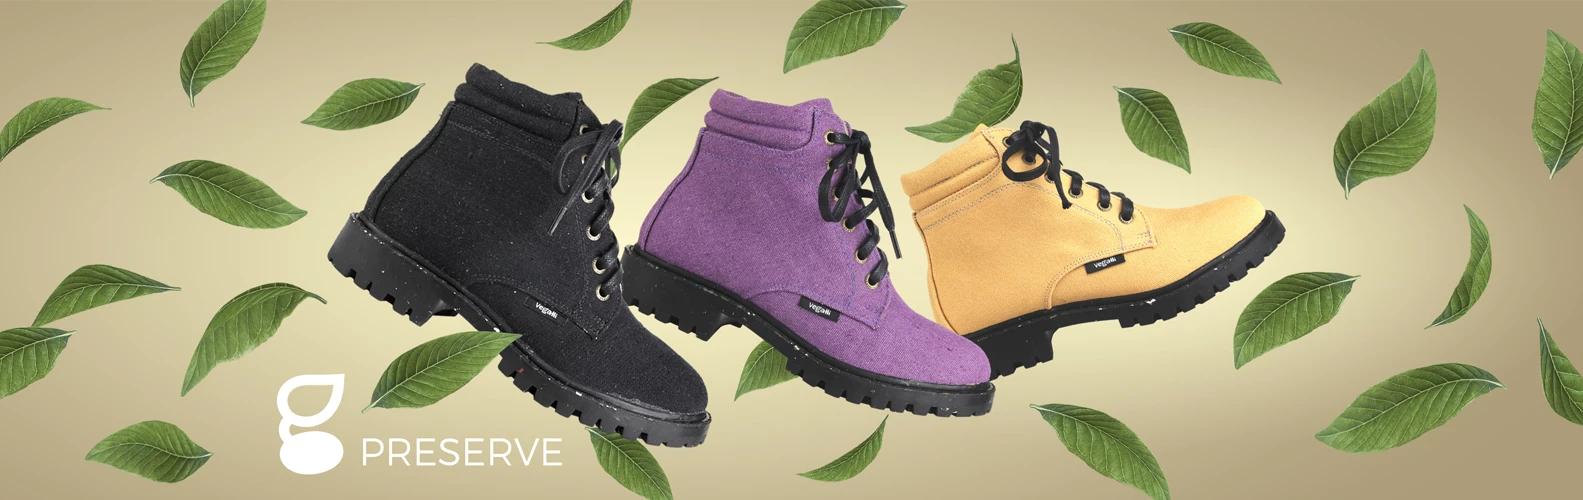 botas vegalli: sapato sustentável